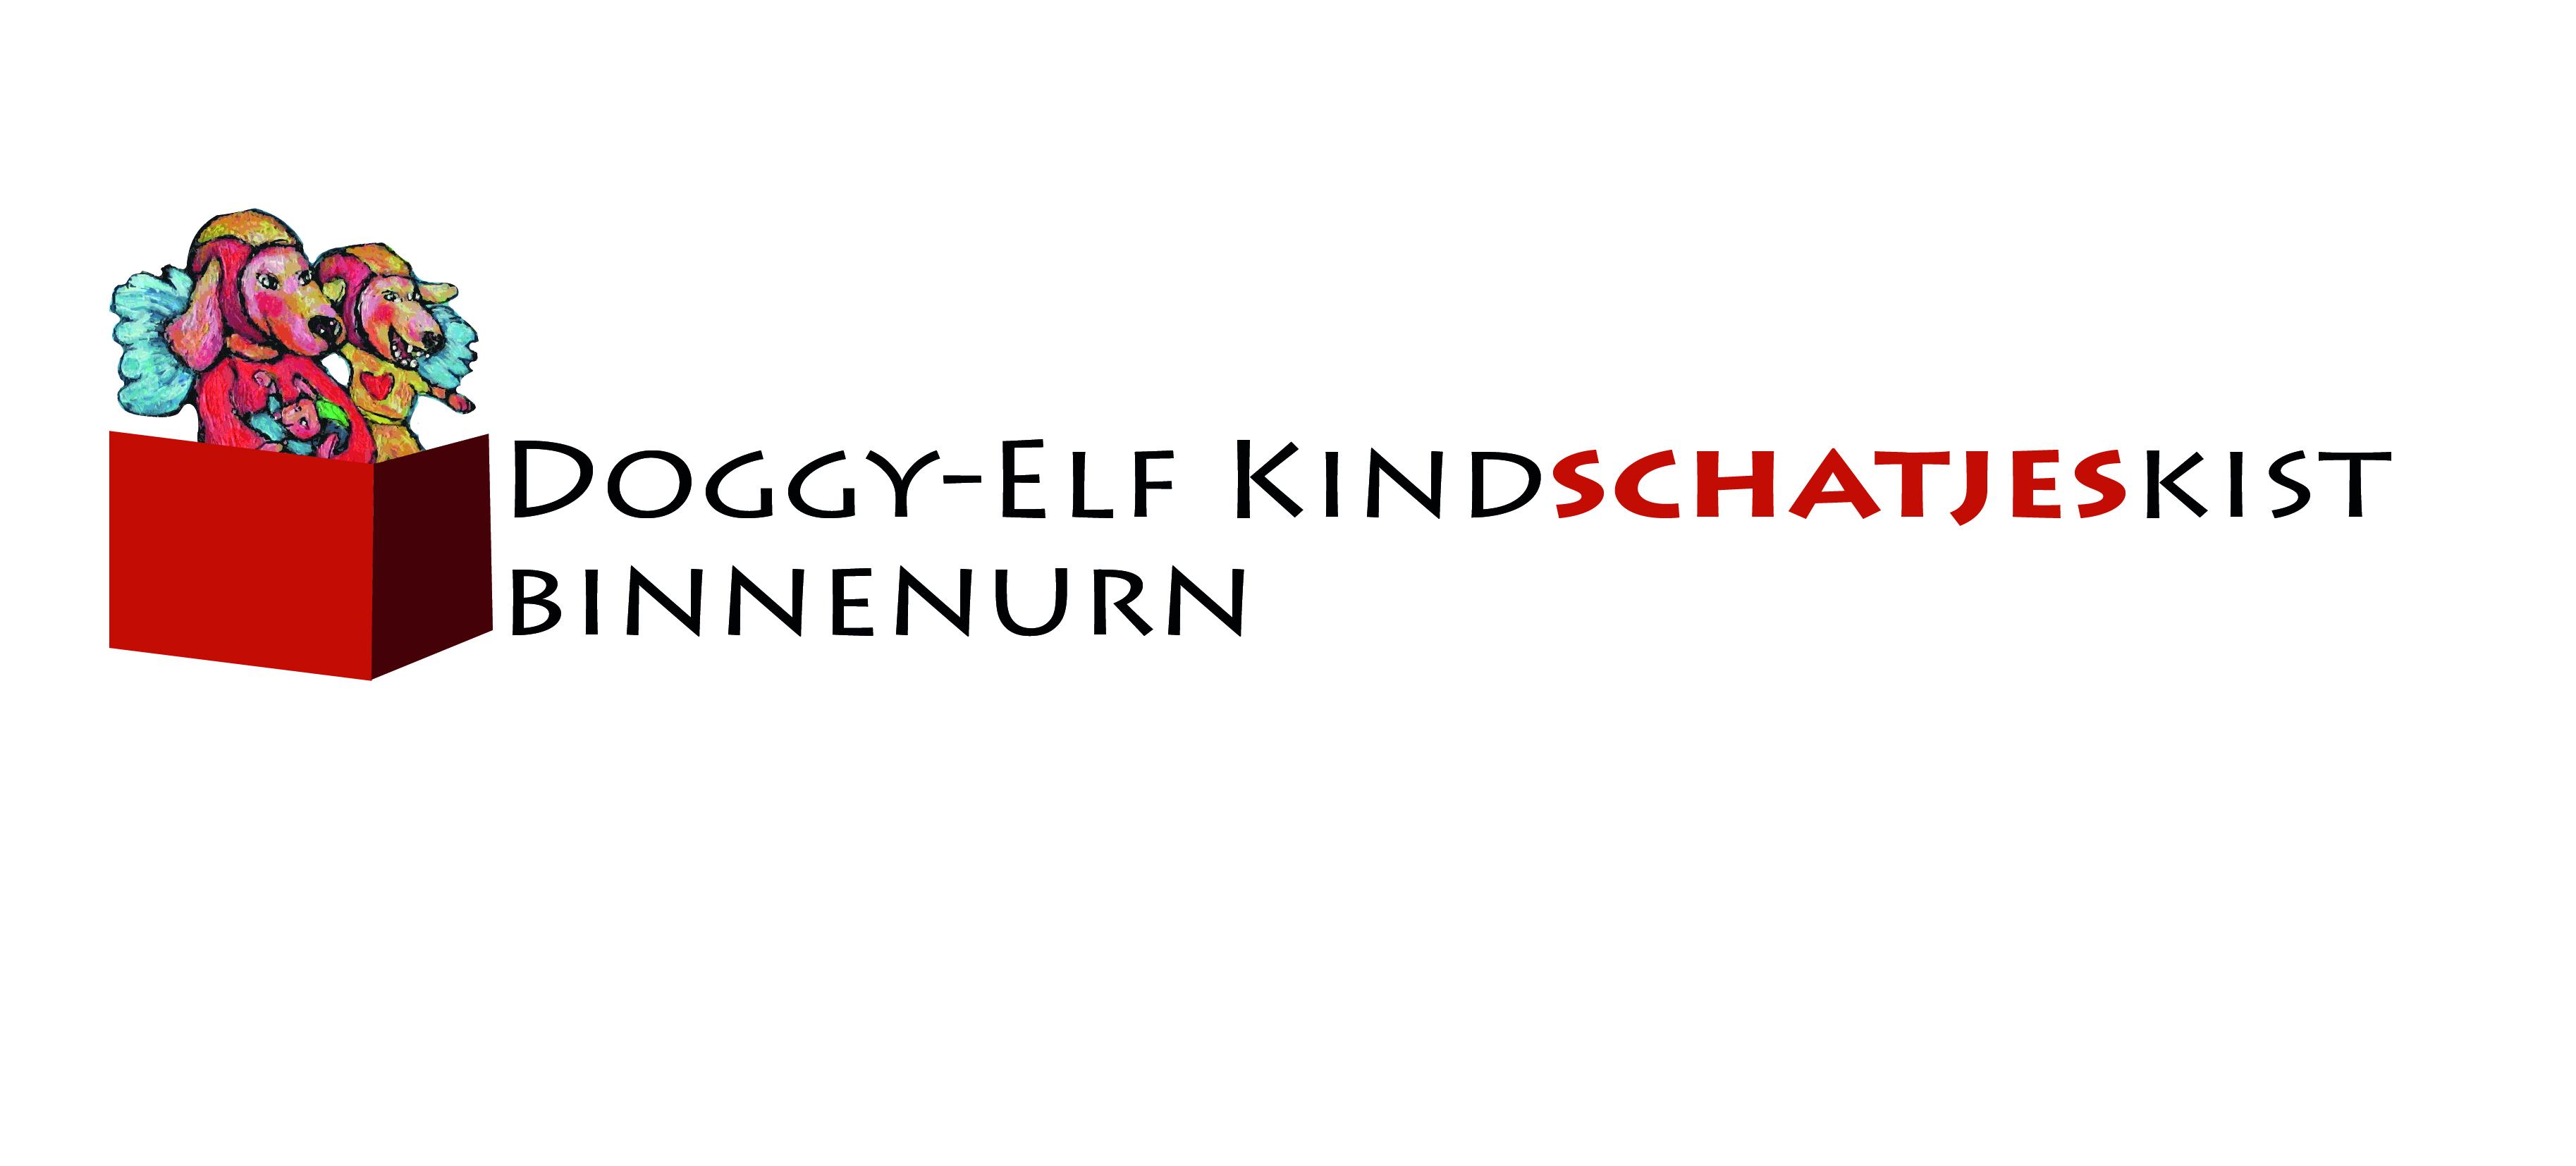 Doggy-Elf schatjeskist - binnenurn logo